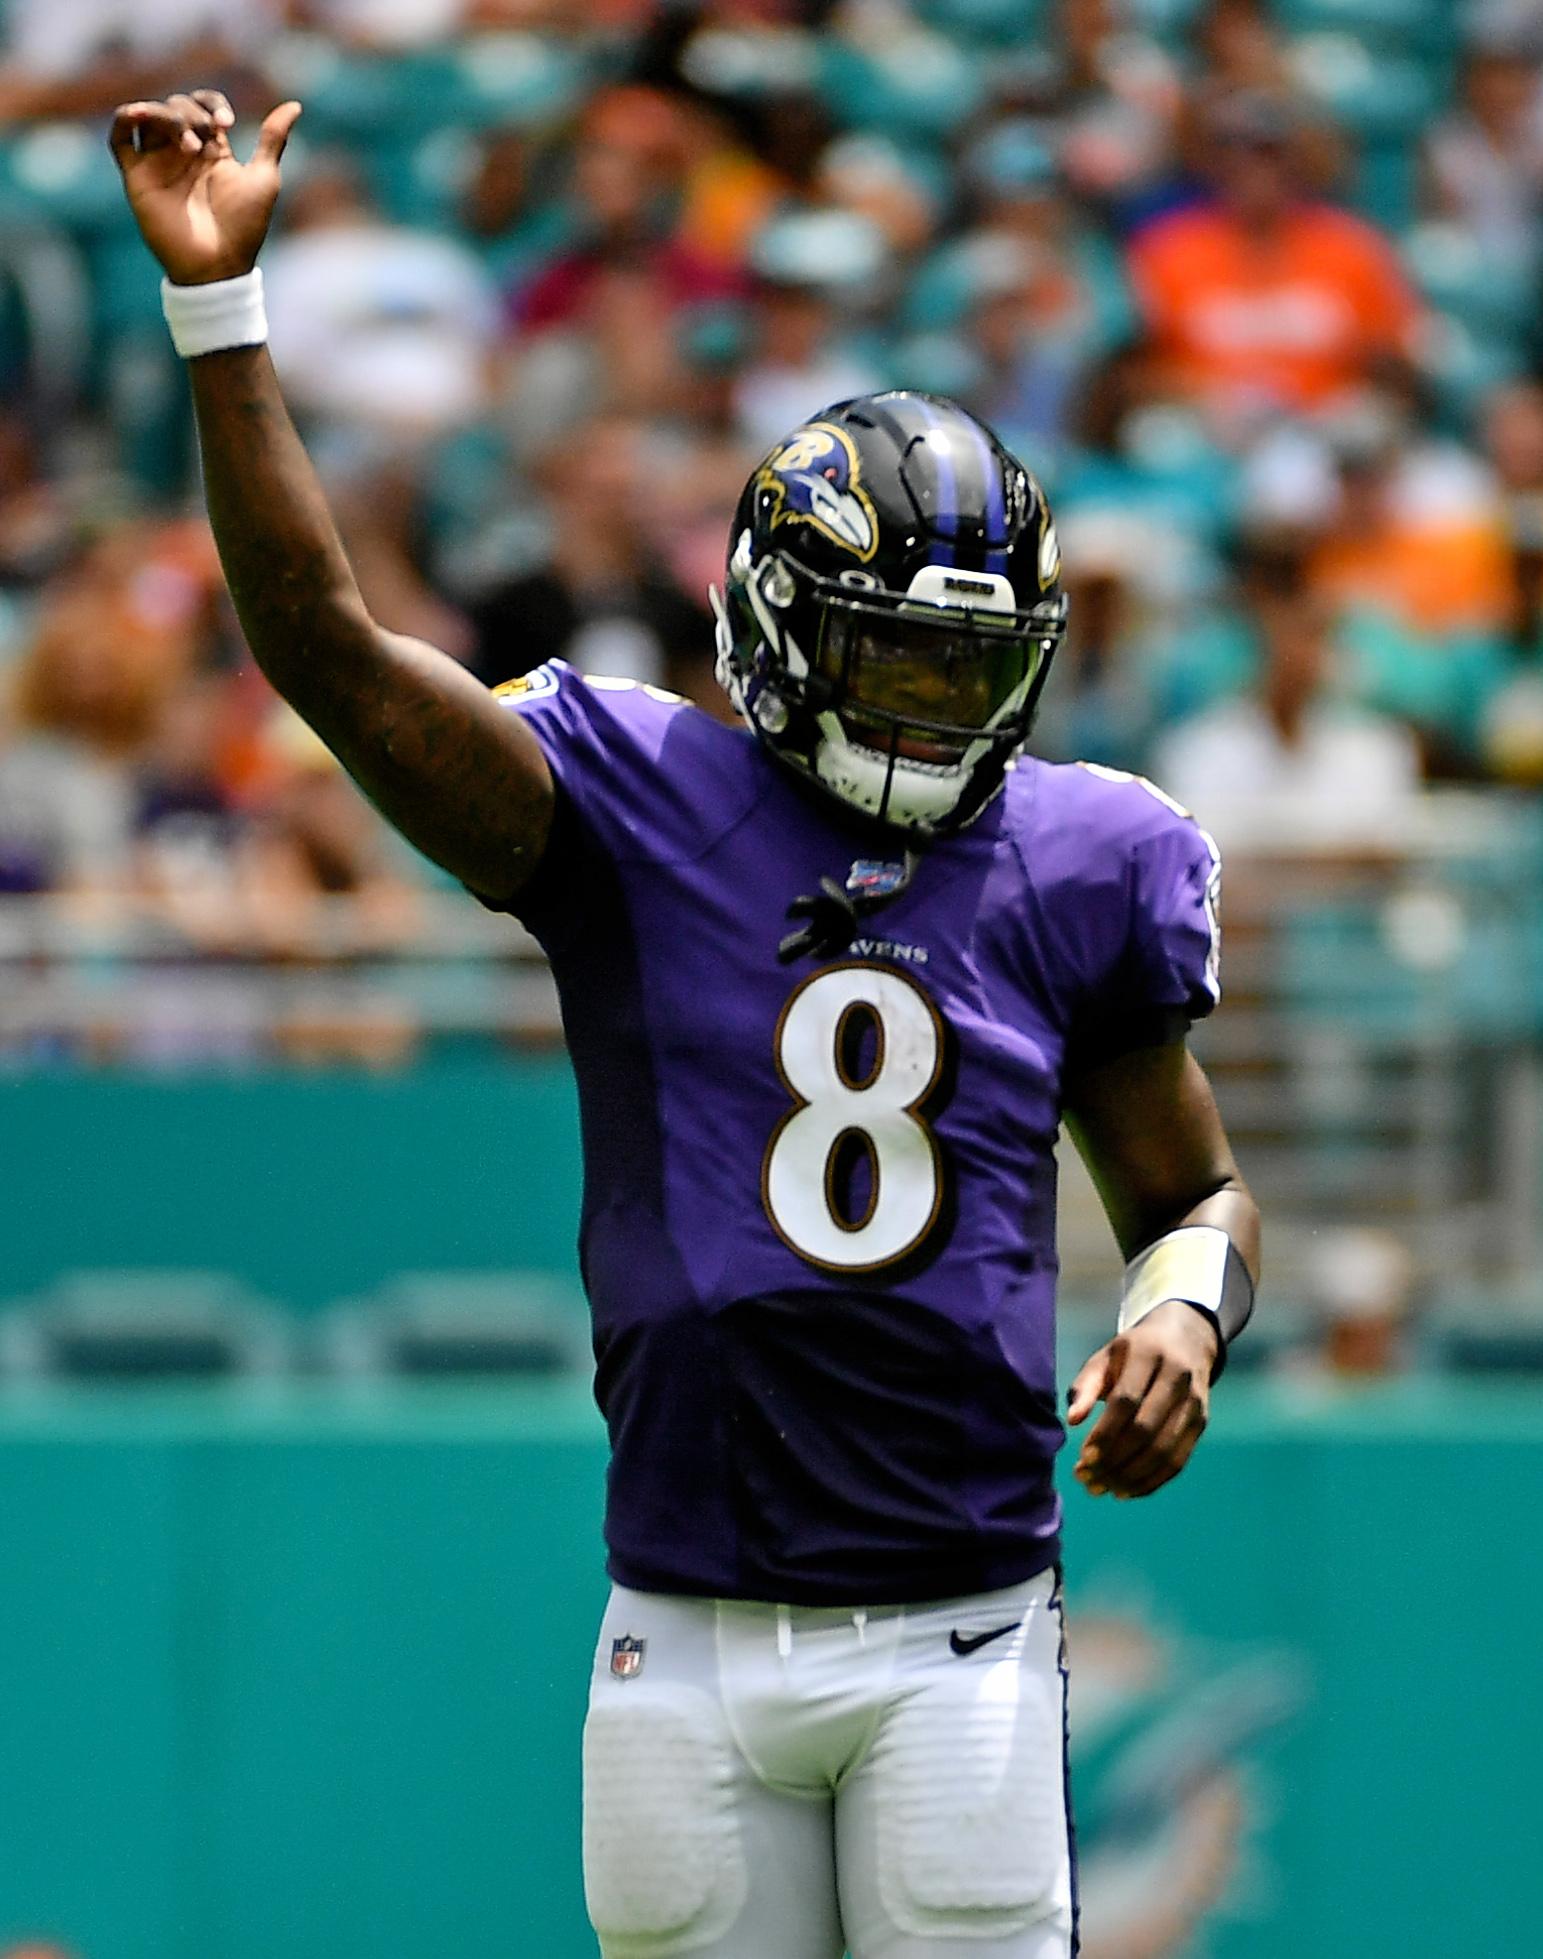 NFL: Baltimore Ravens at Miami Dolphins